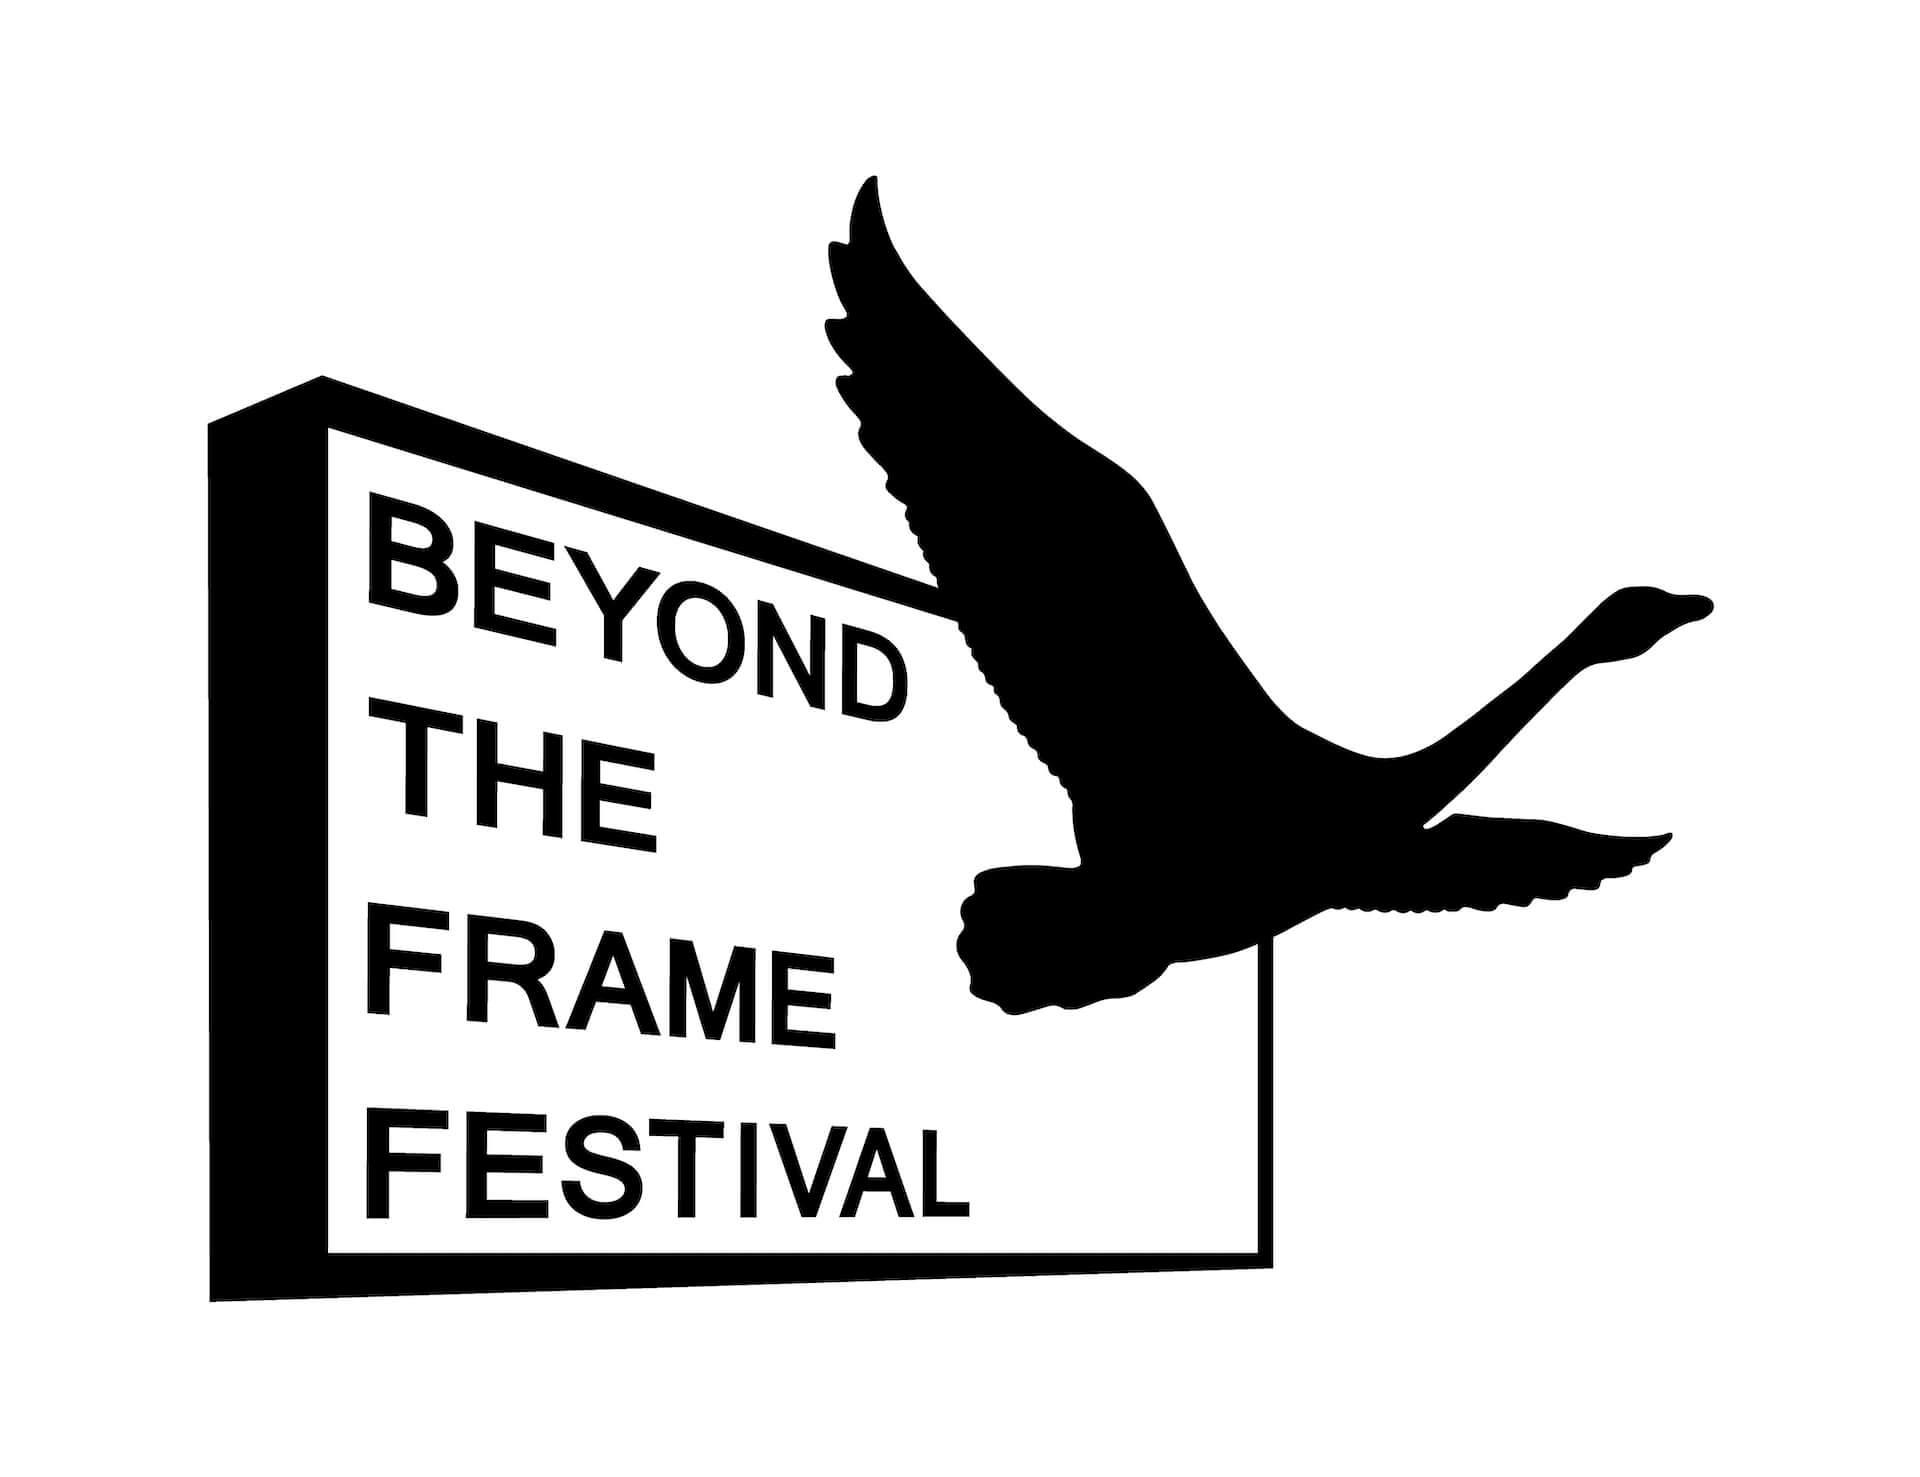 VR映画に特化した国際映画祭<Beyond The Frame Festival>がオンラインで開催決定!審査員は園子温、大宮エリー、福田淳 film210120_btff_3-1920x1477